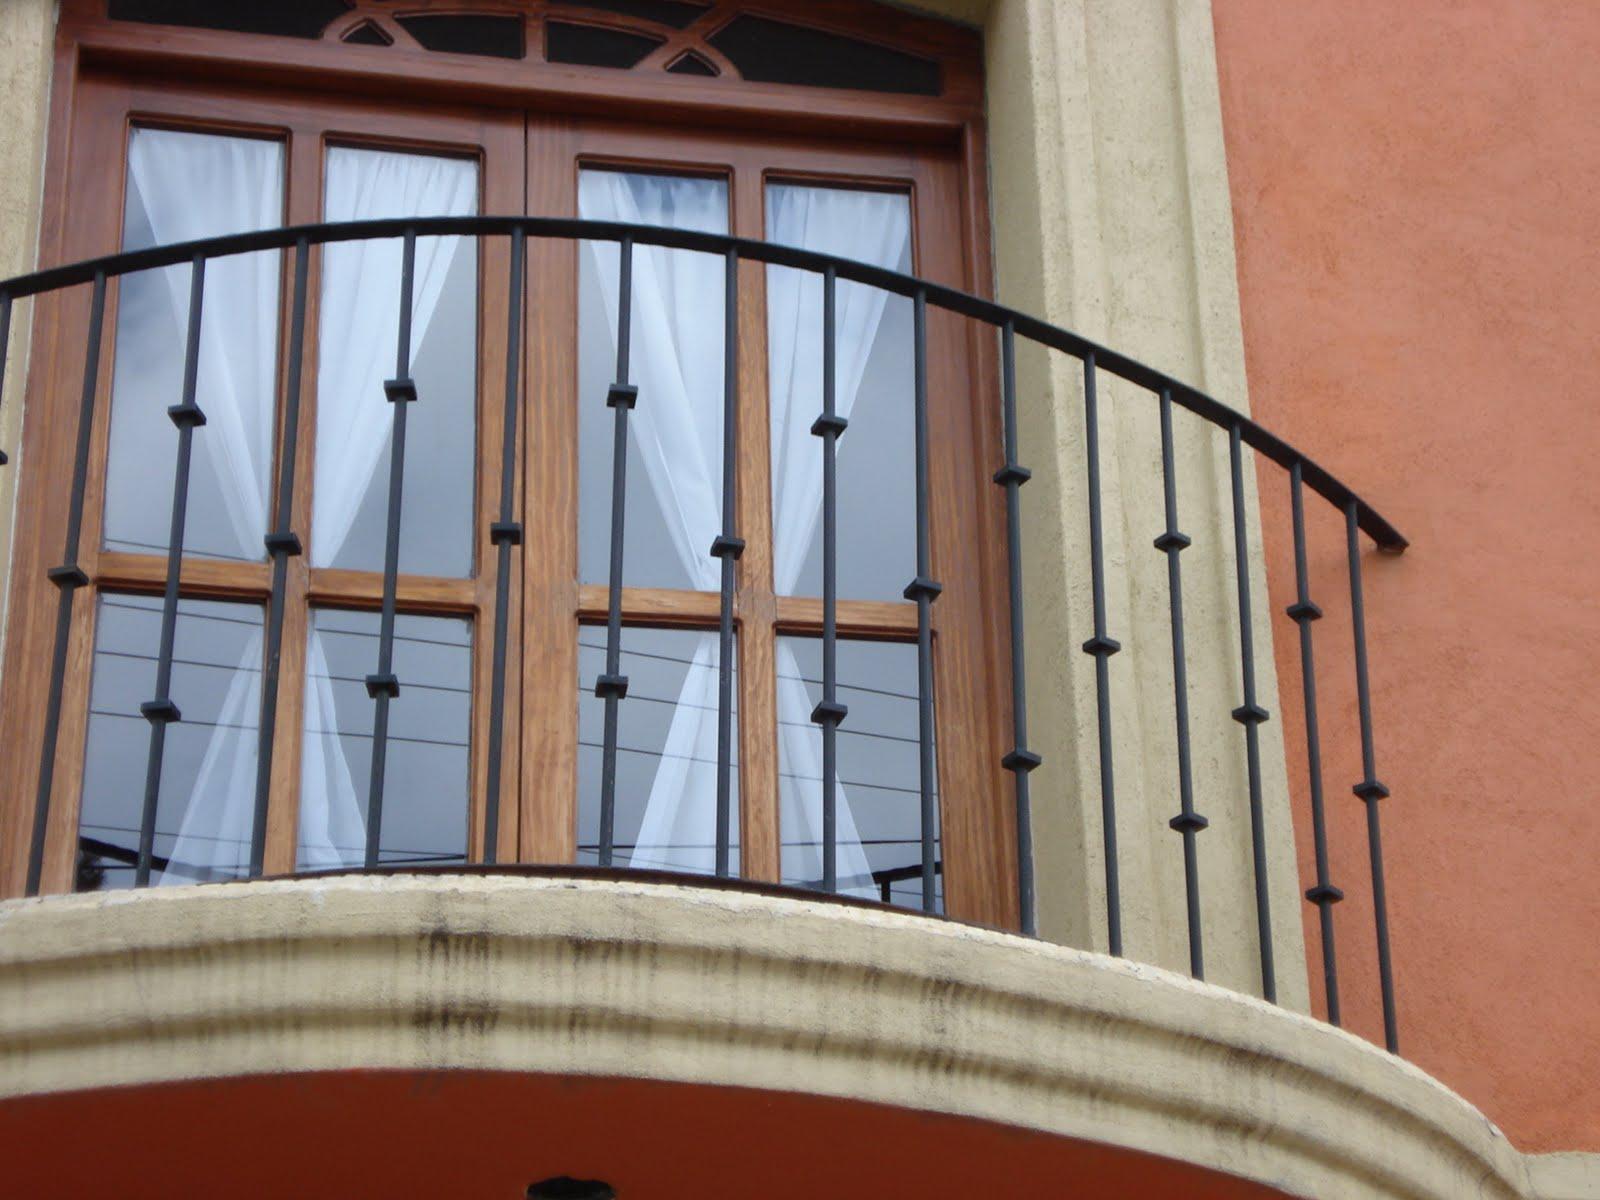 Herreria sil balcones for Modelos de balcones modernos para casas